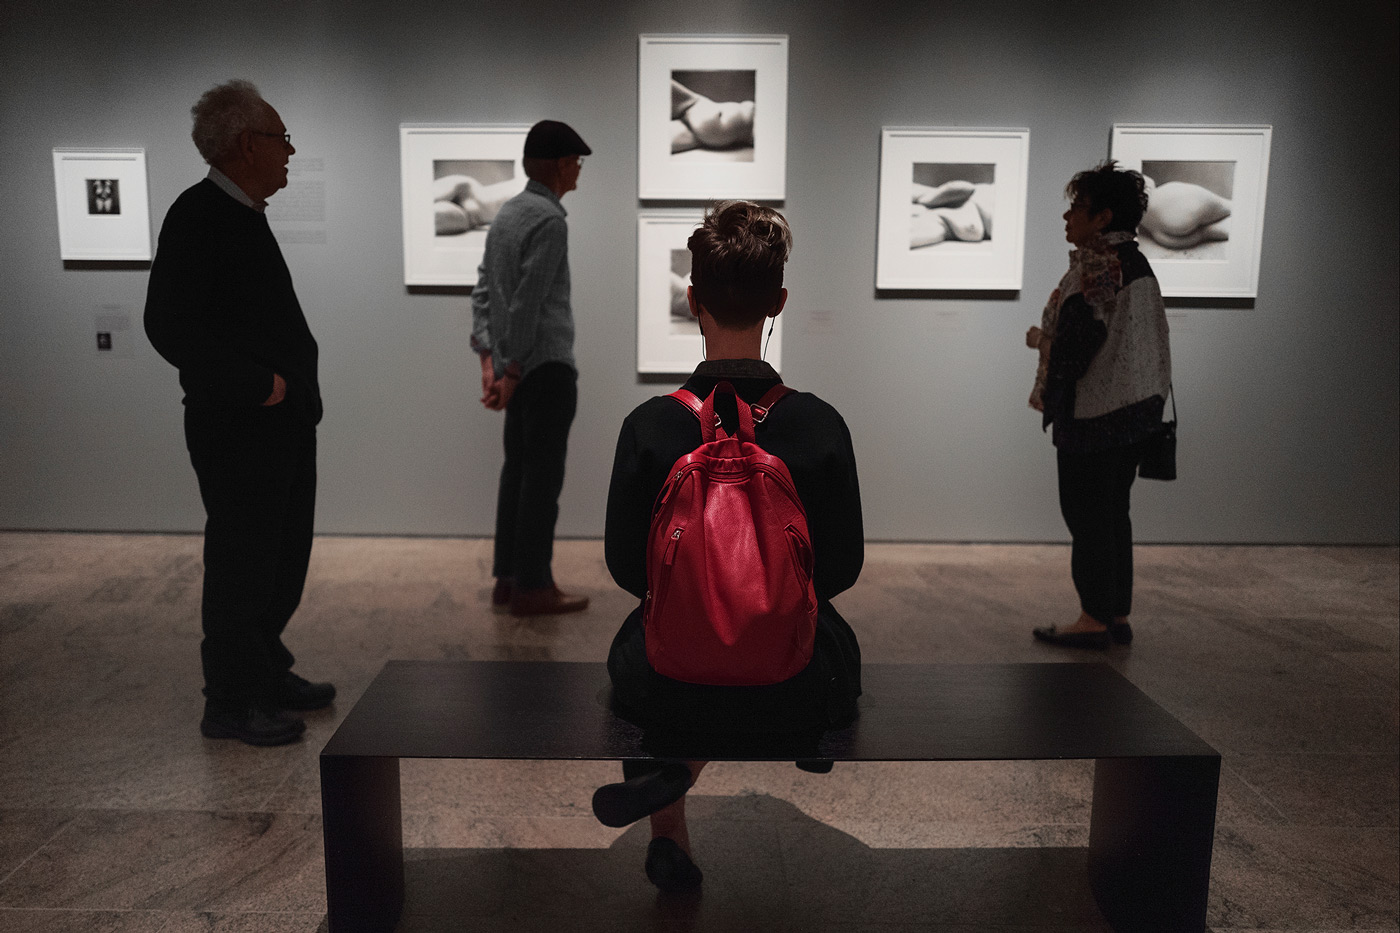 William-Bullard_USA_Pictures-at-an-Exhibition_03.jpeg